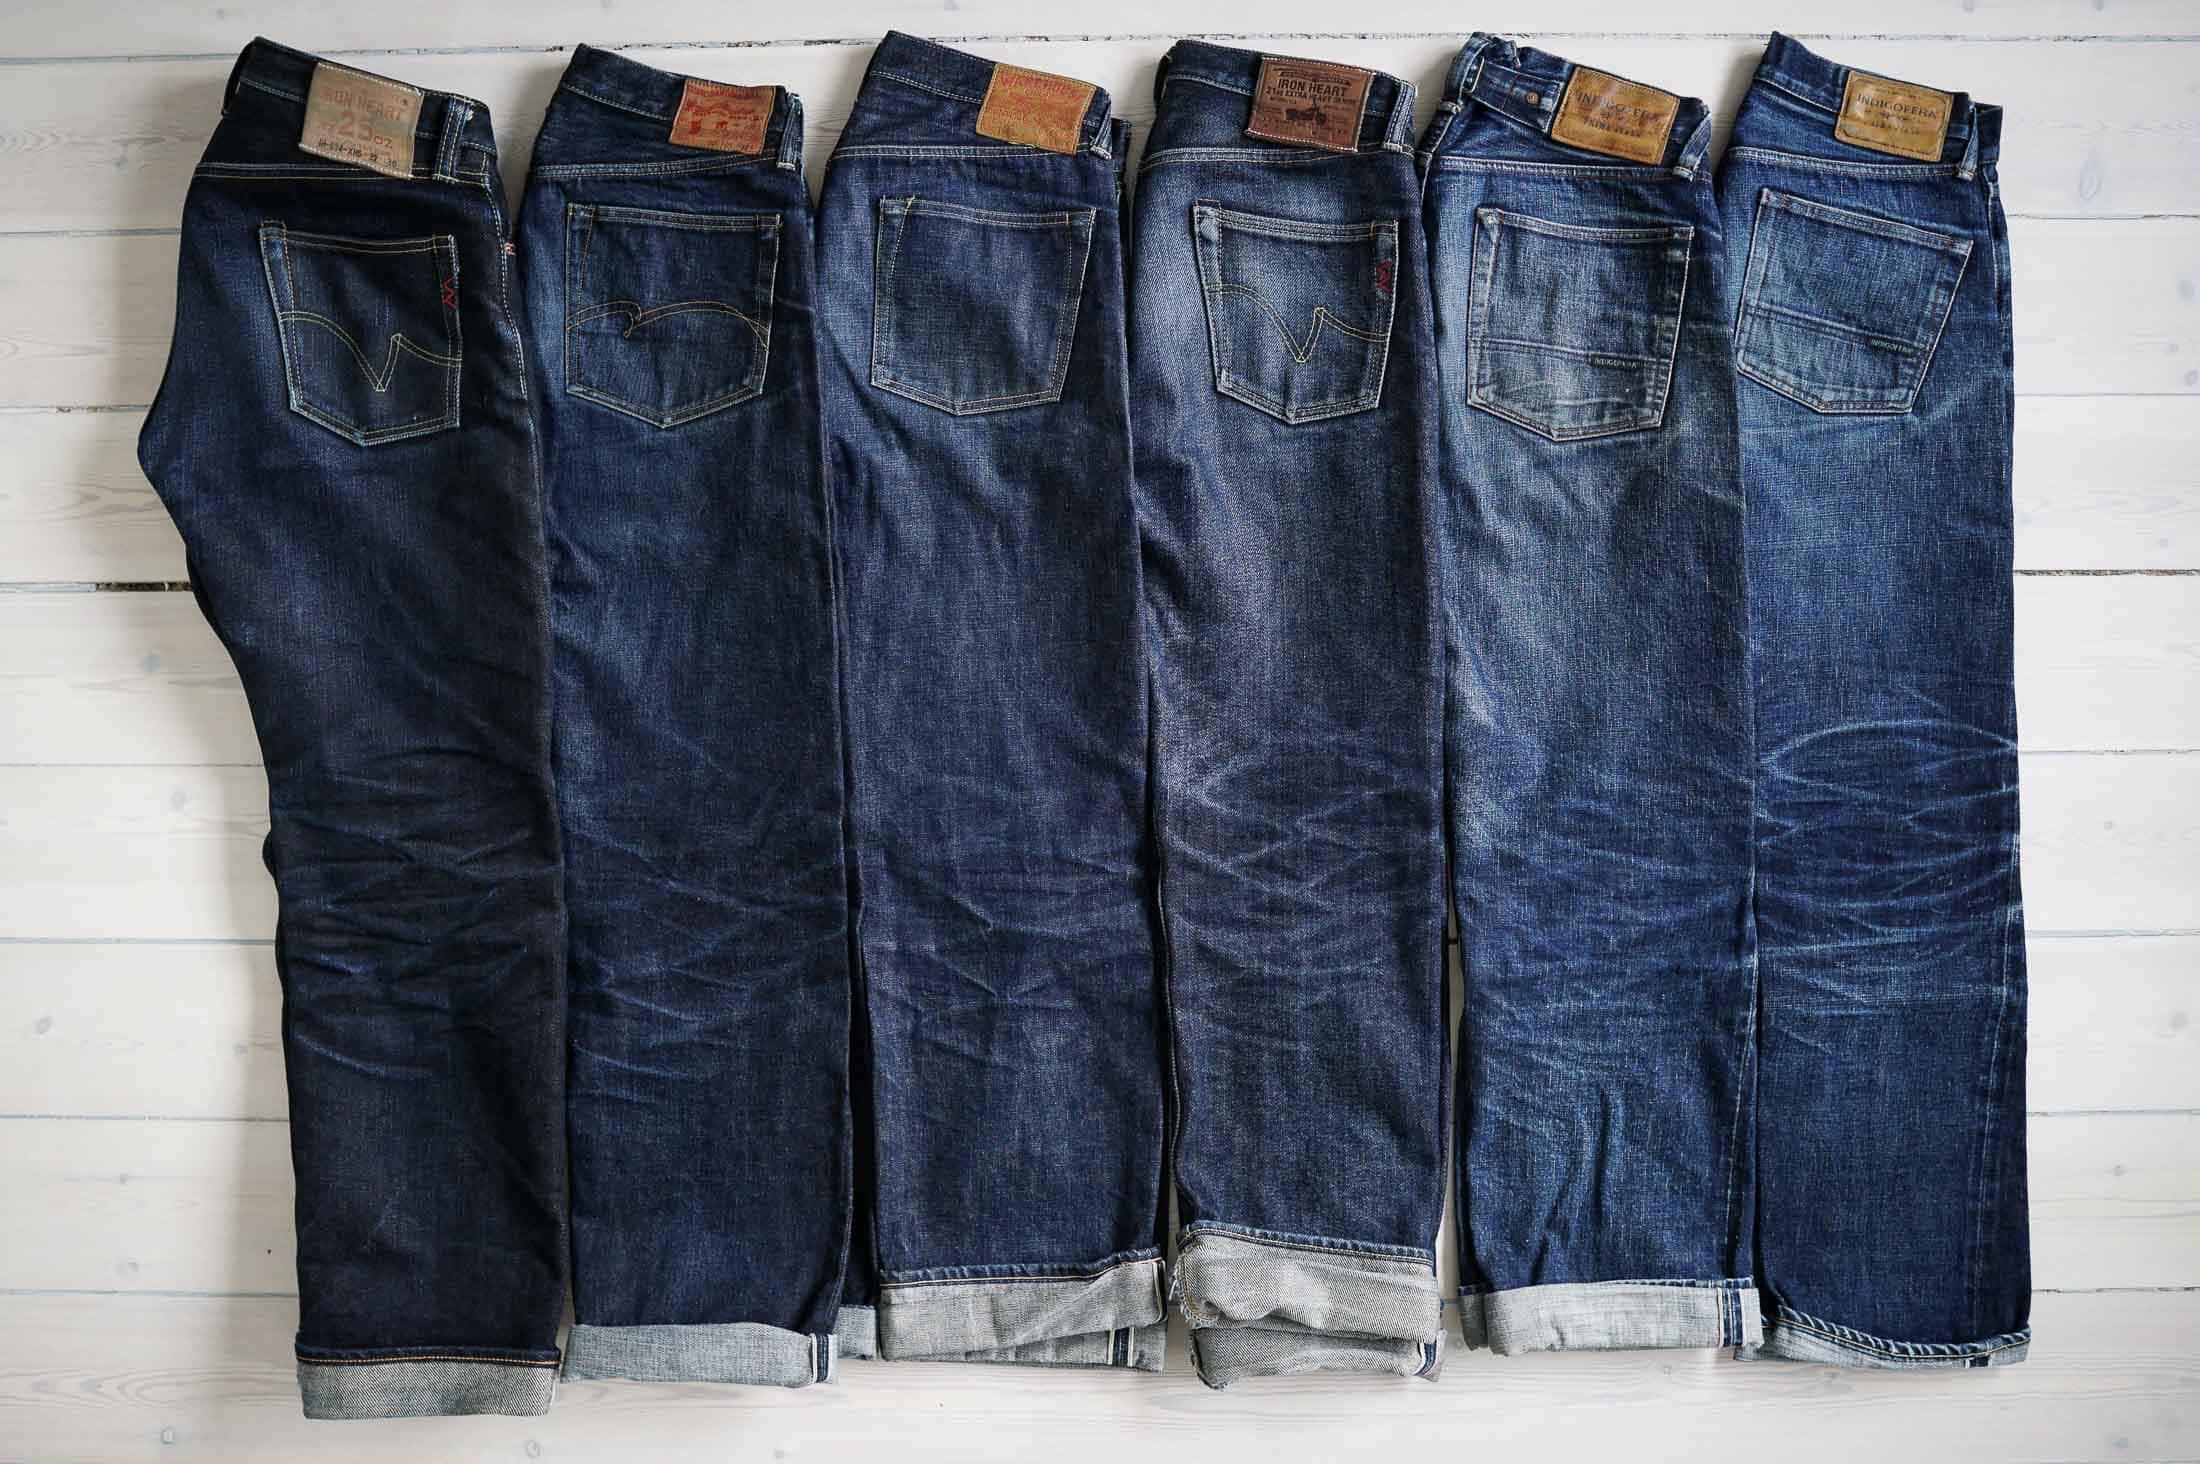 Kenali-bahan-celana-jeans-yang-baik